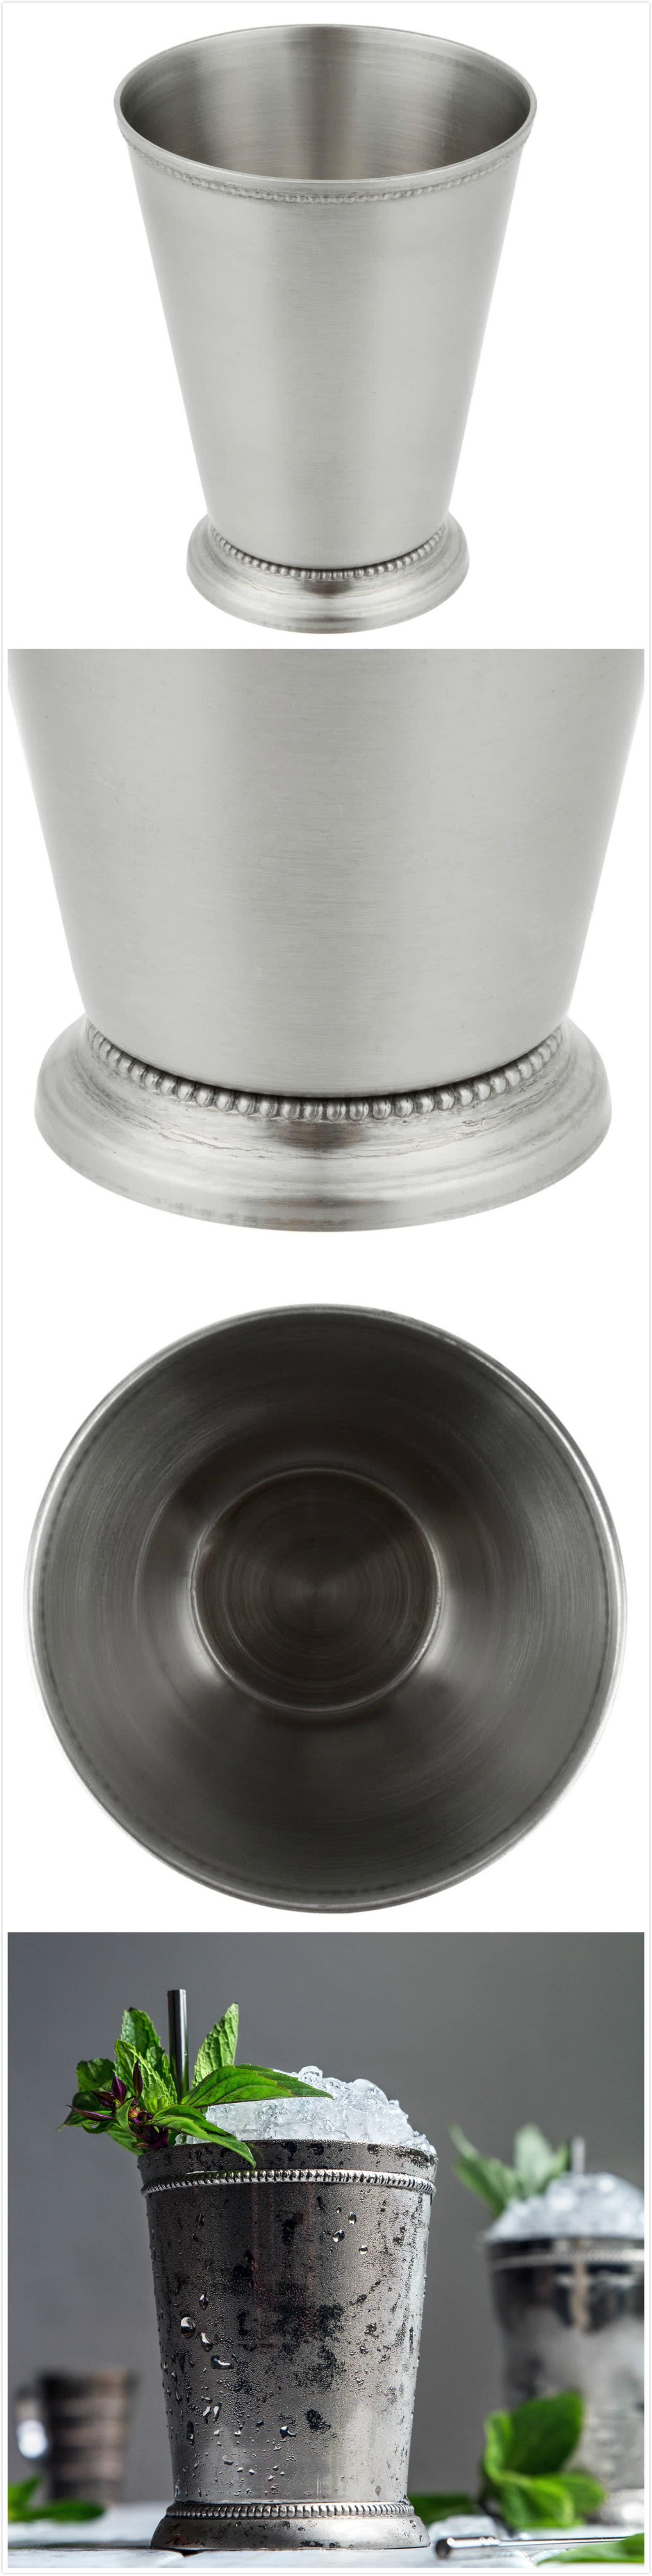 Stainless steel double wall vacuum beer mug/beer cup/coffee mug without lid